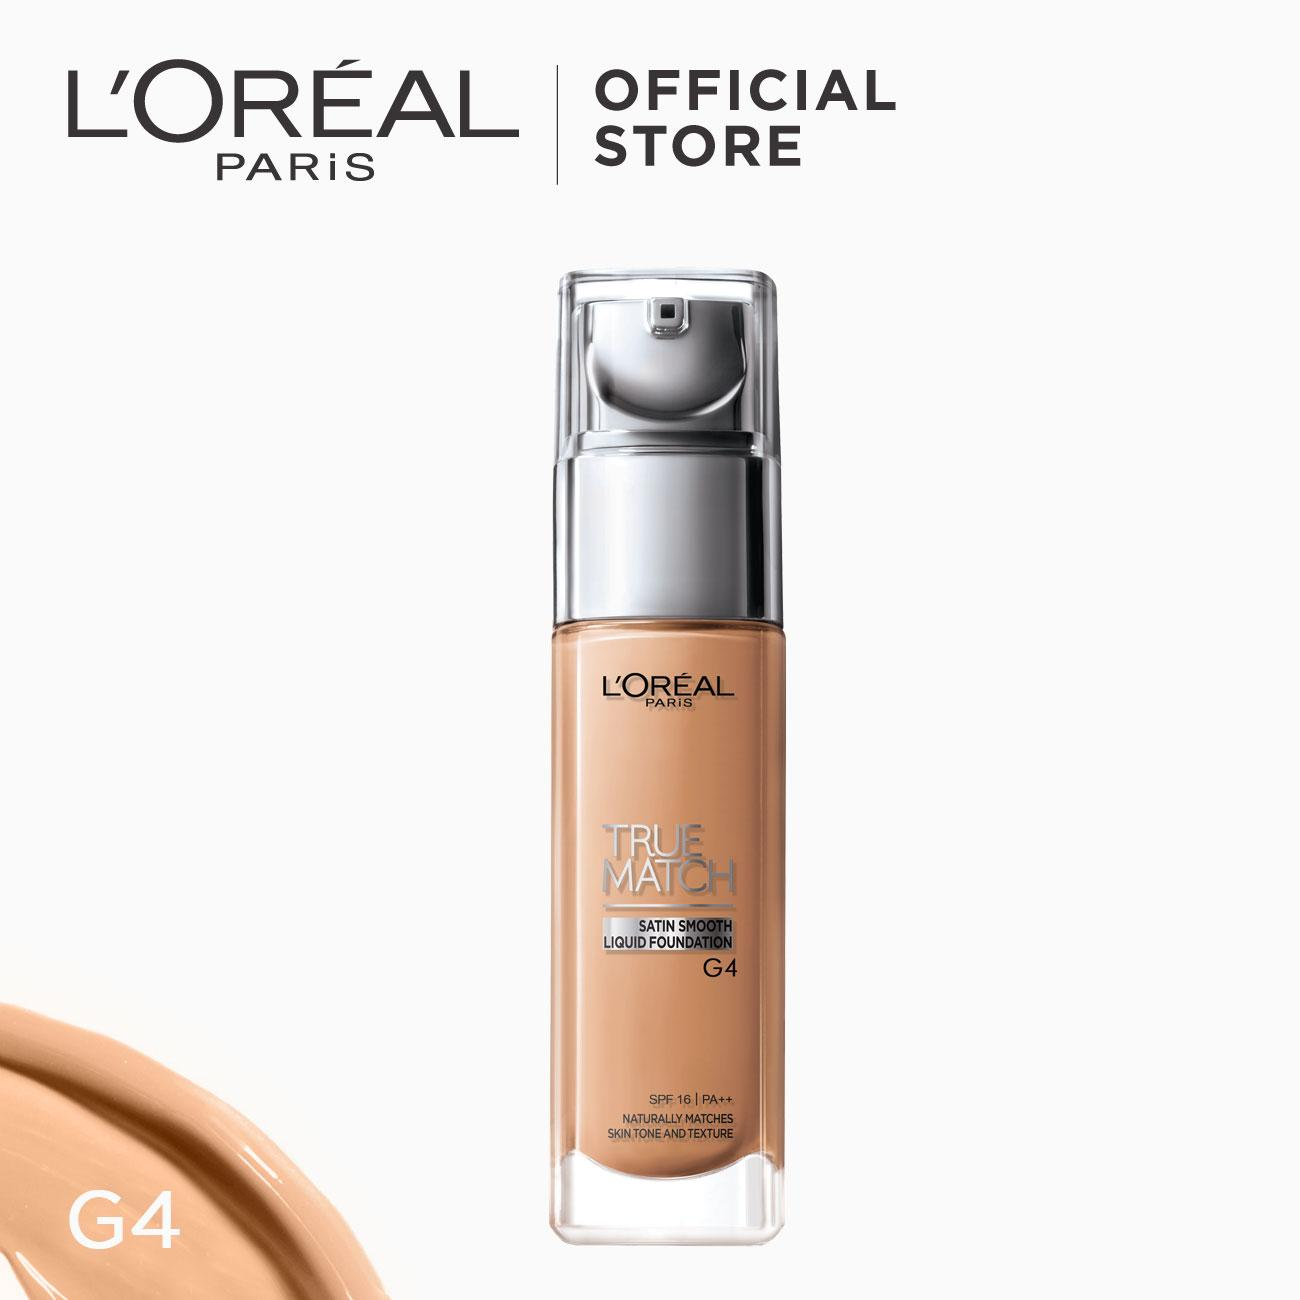 True Match Natural Finish Liquid Foundation - G4 Gold Beige by LOréal Paris Philippines